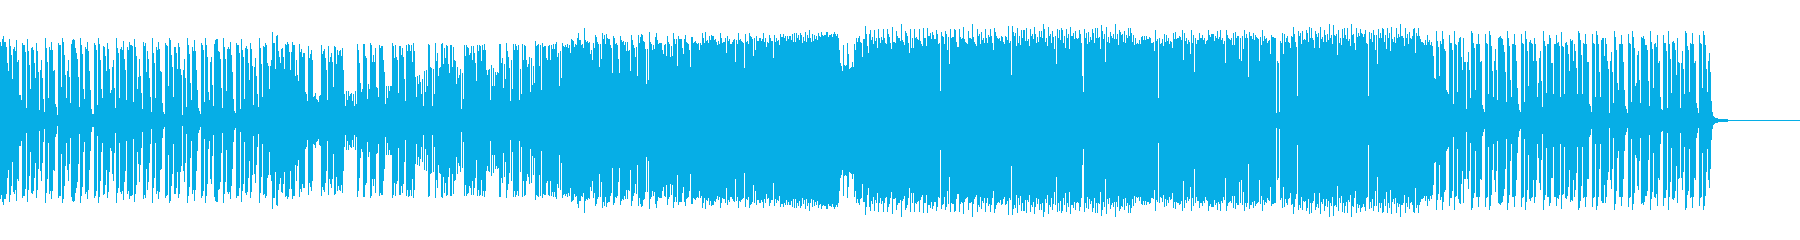 DJ Snakeを参考にしたトラップの再生済みの波形